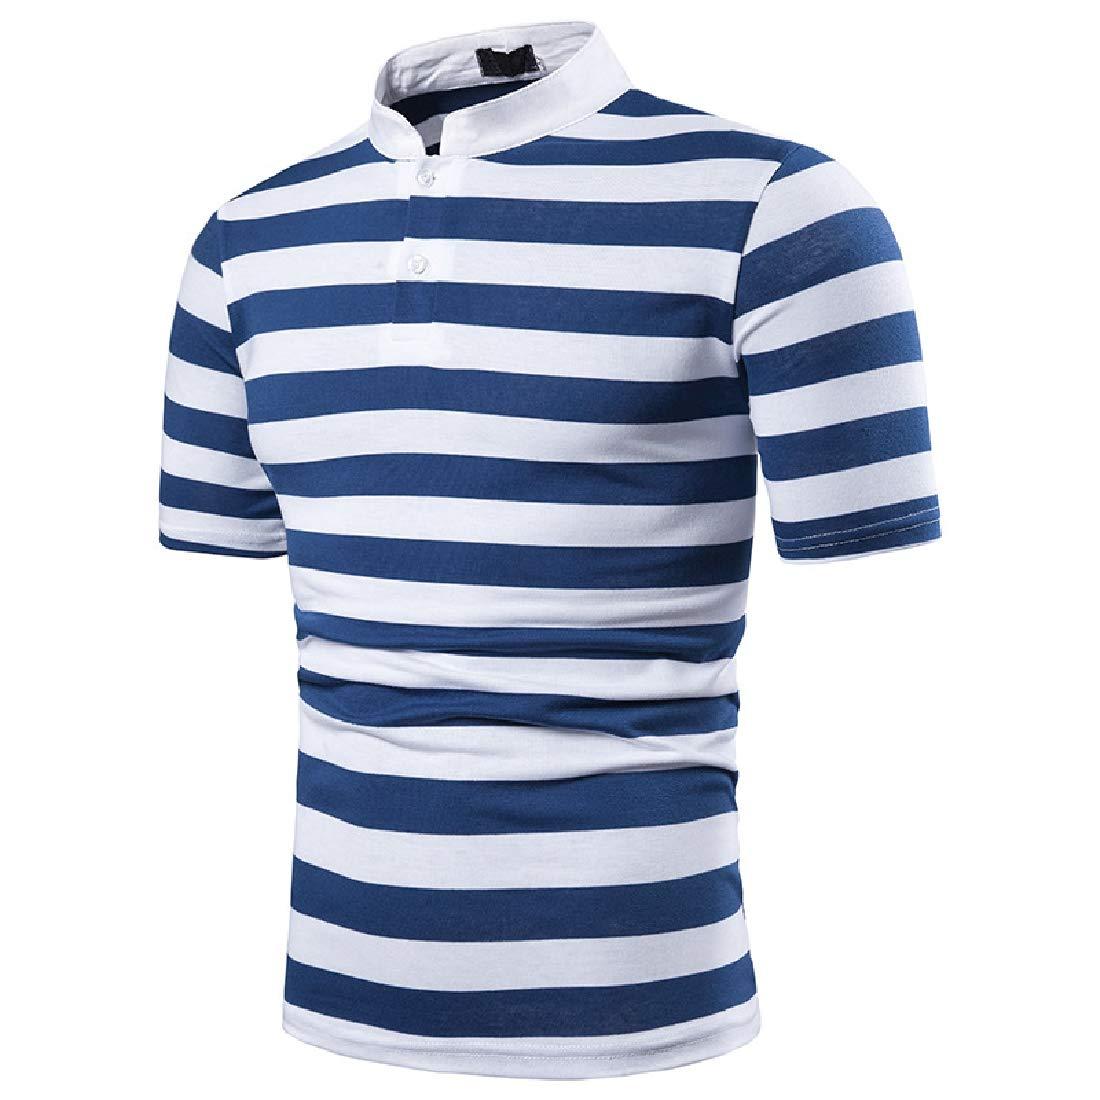 Domple Mens OL Short Sleeve Lapel Stylish Stripe T-Shirt Tee